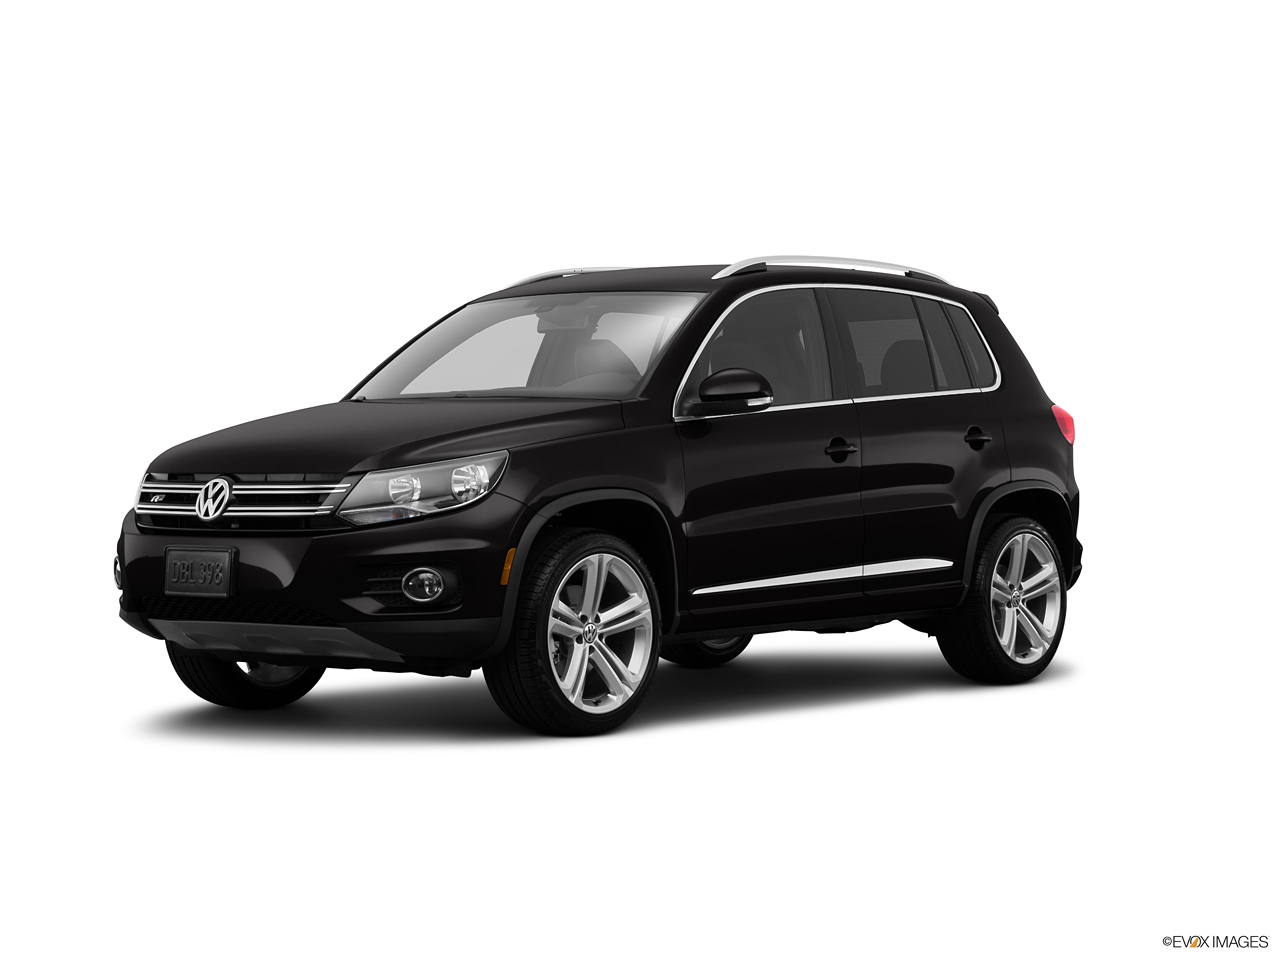 Car Pictures List For Volkswagen Tiguan 2016 2 0l R Line